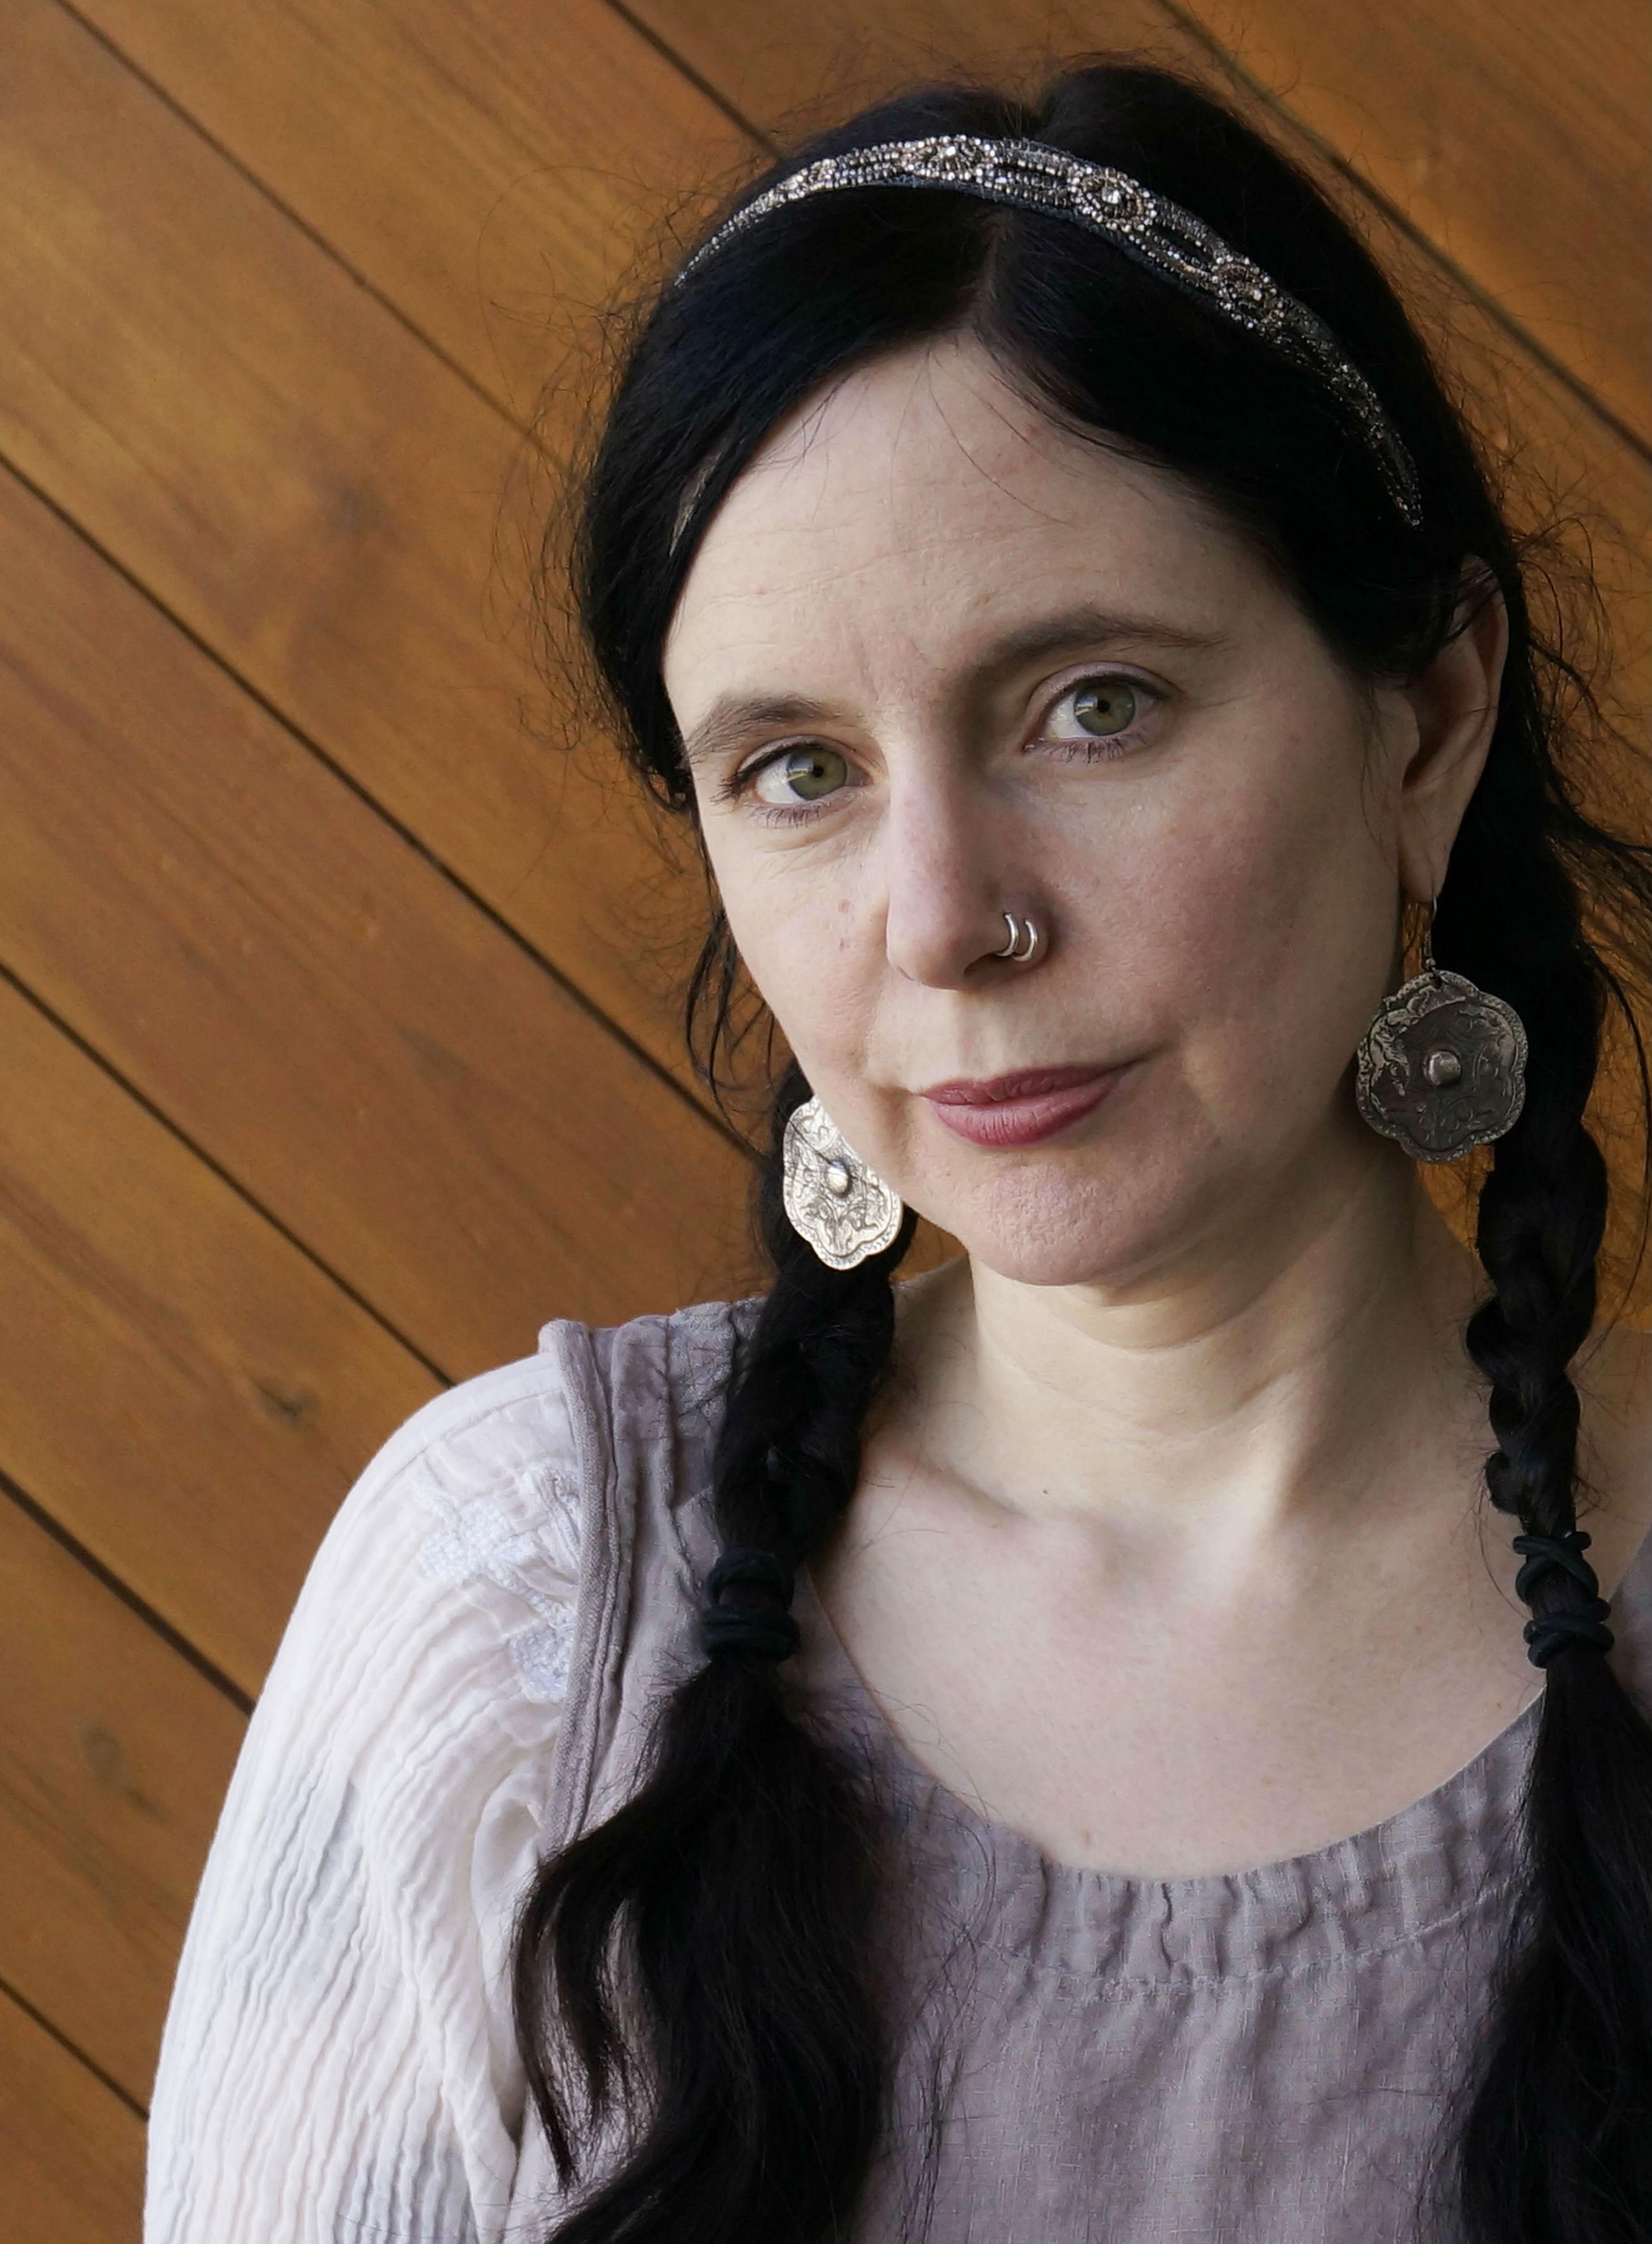 Photo: Boulder writer Sarah Elizabeth Schantz